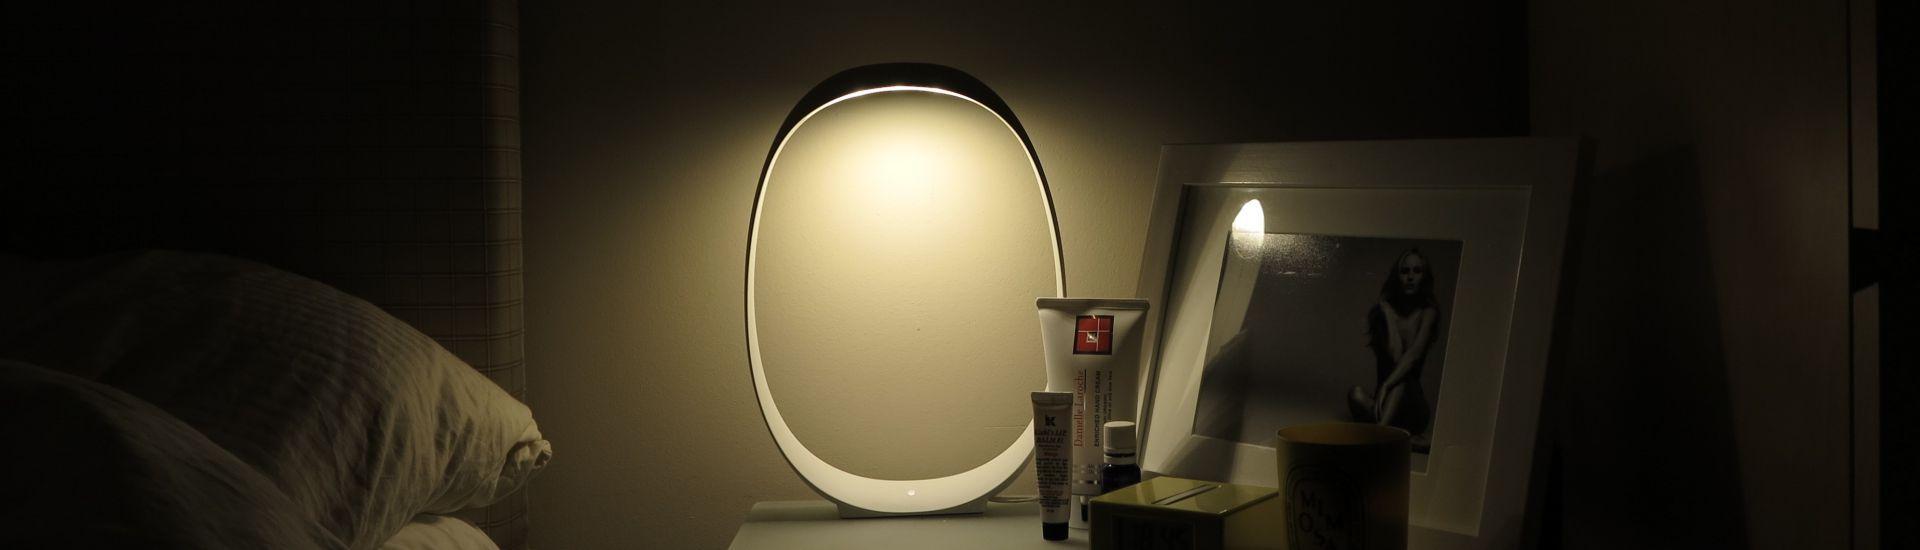 Anisha Sobremesa Grande 46cm LED 4,5w 3000K con regulador blanco